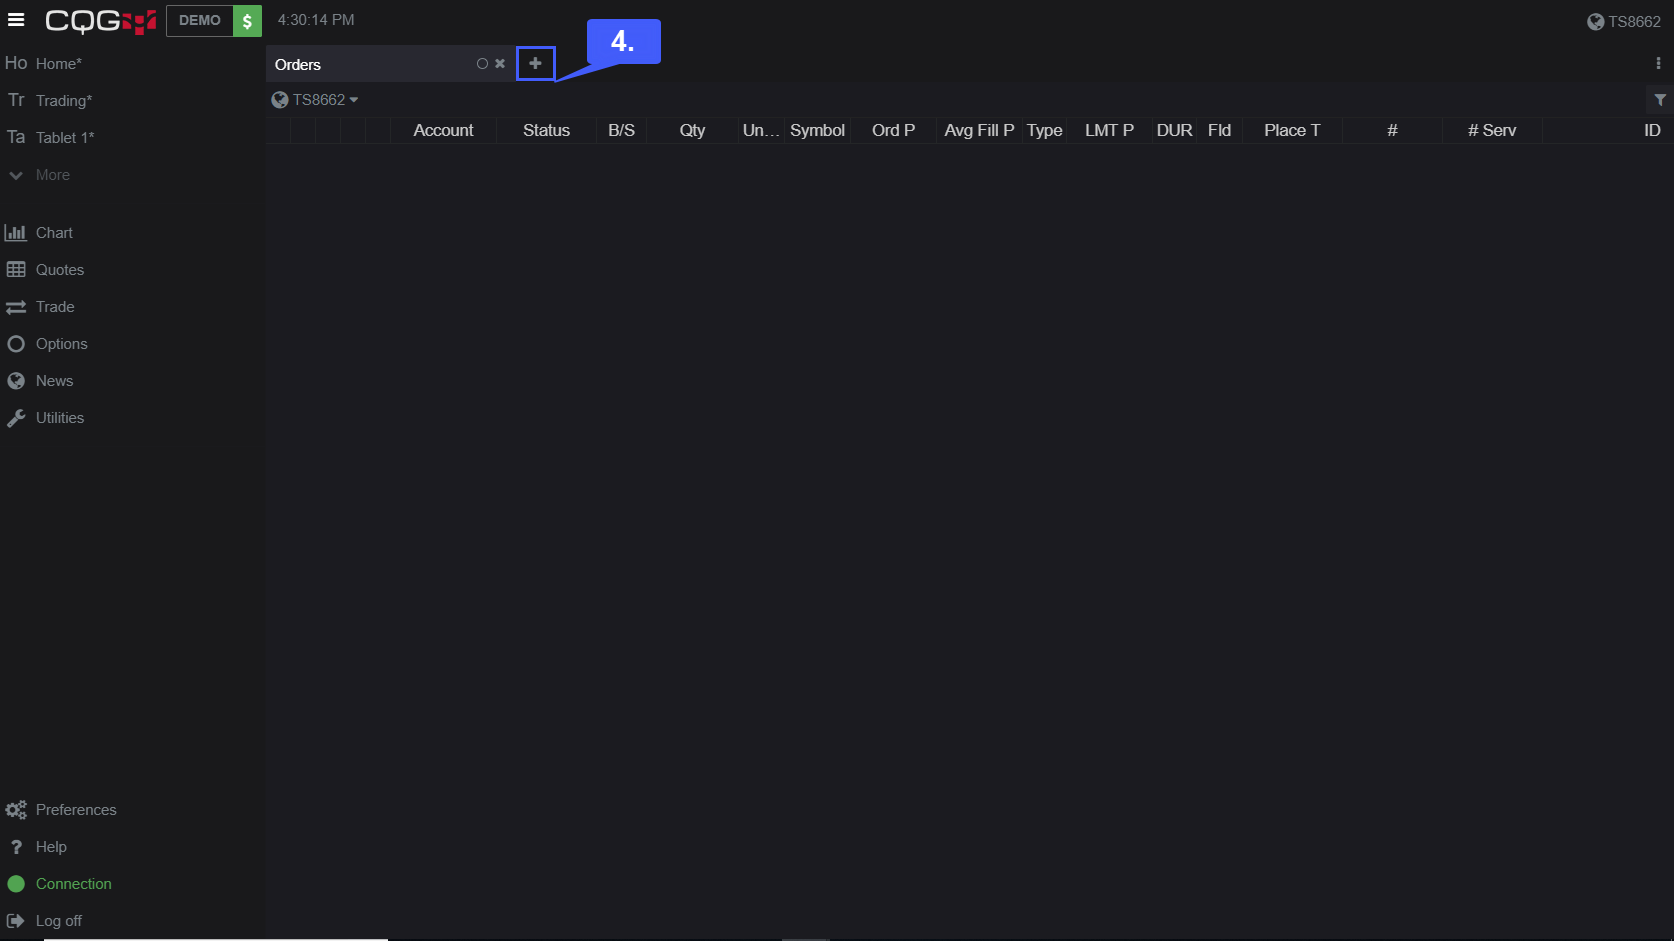 CQG Desktop Trade Activity 4